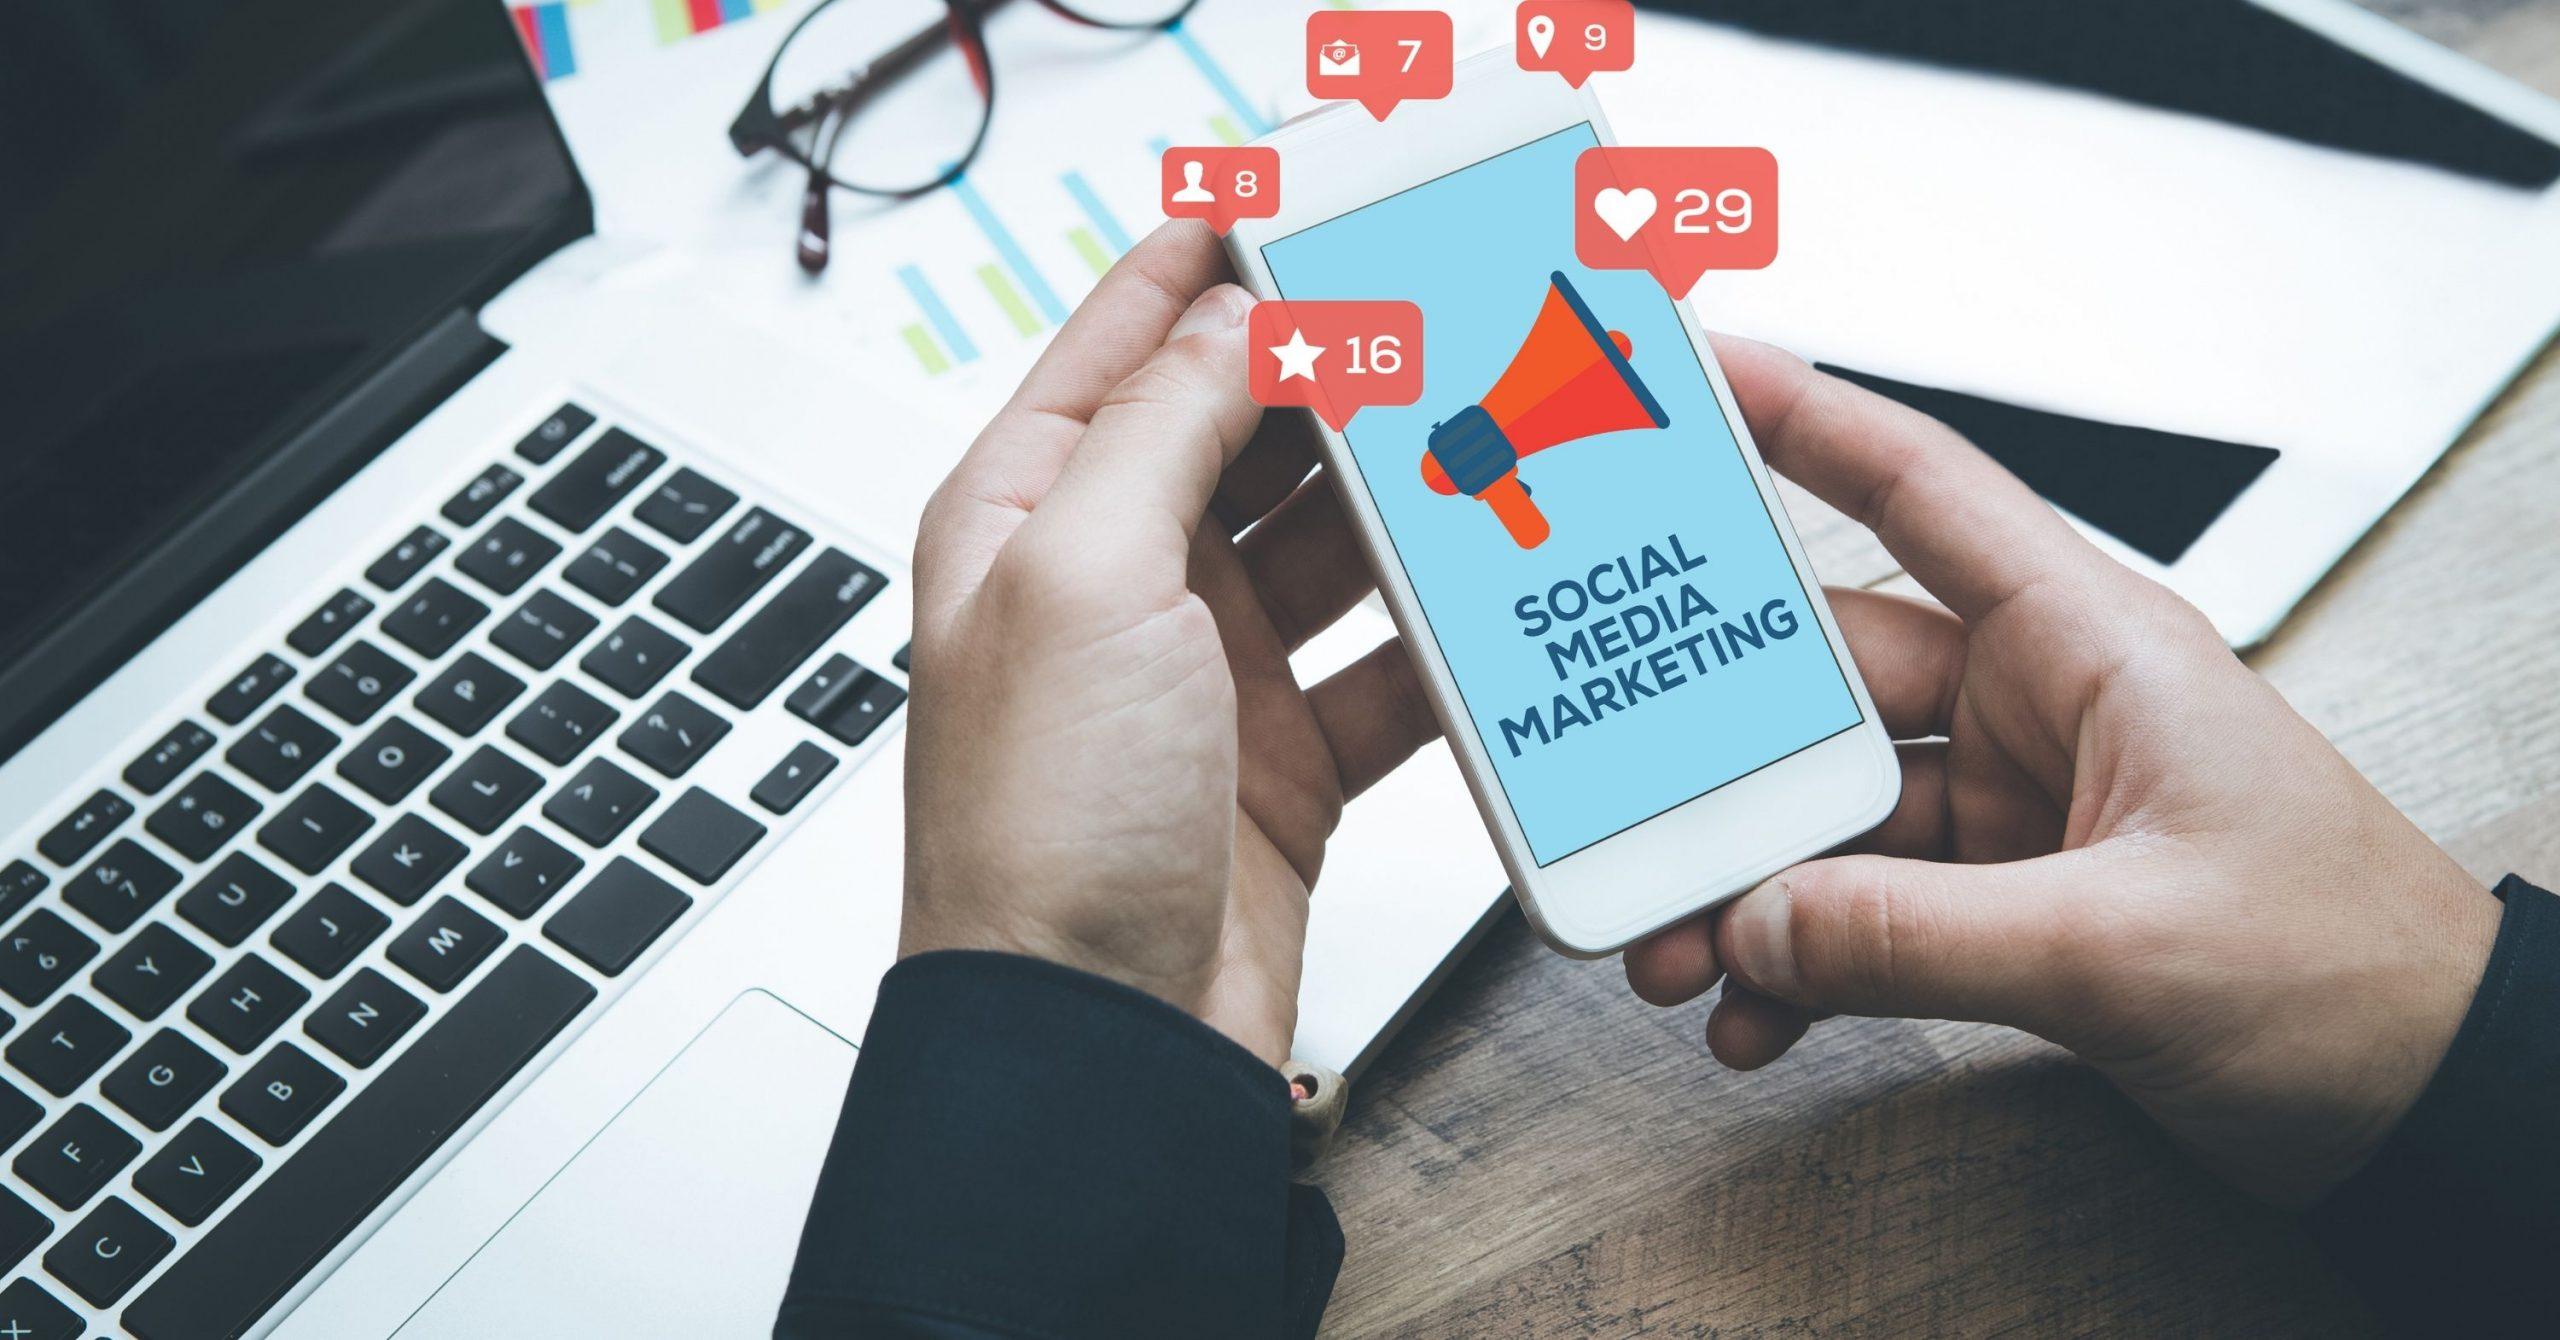 Do we need to measure ROI for Social Media Marketing?